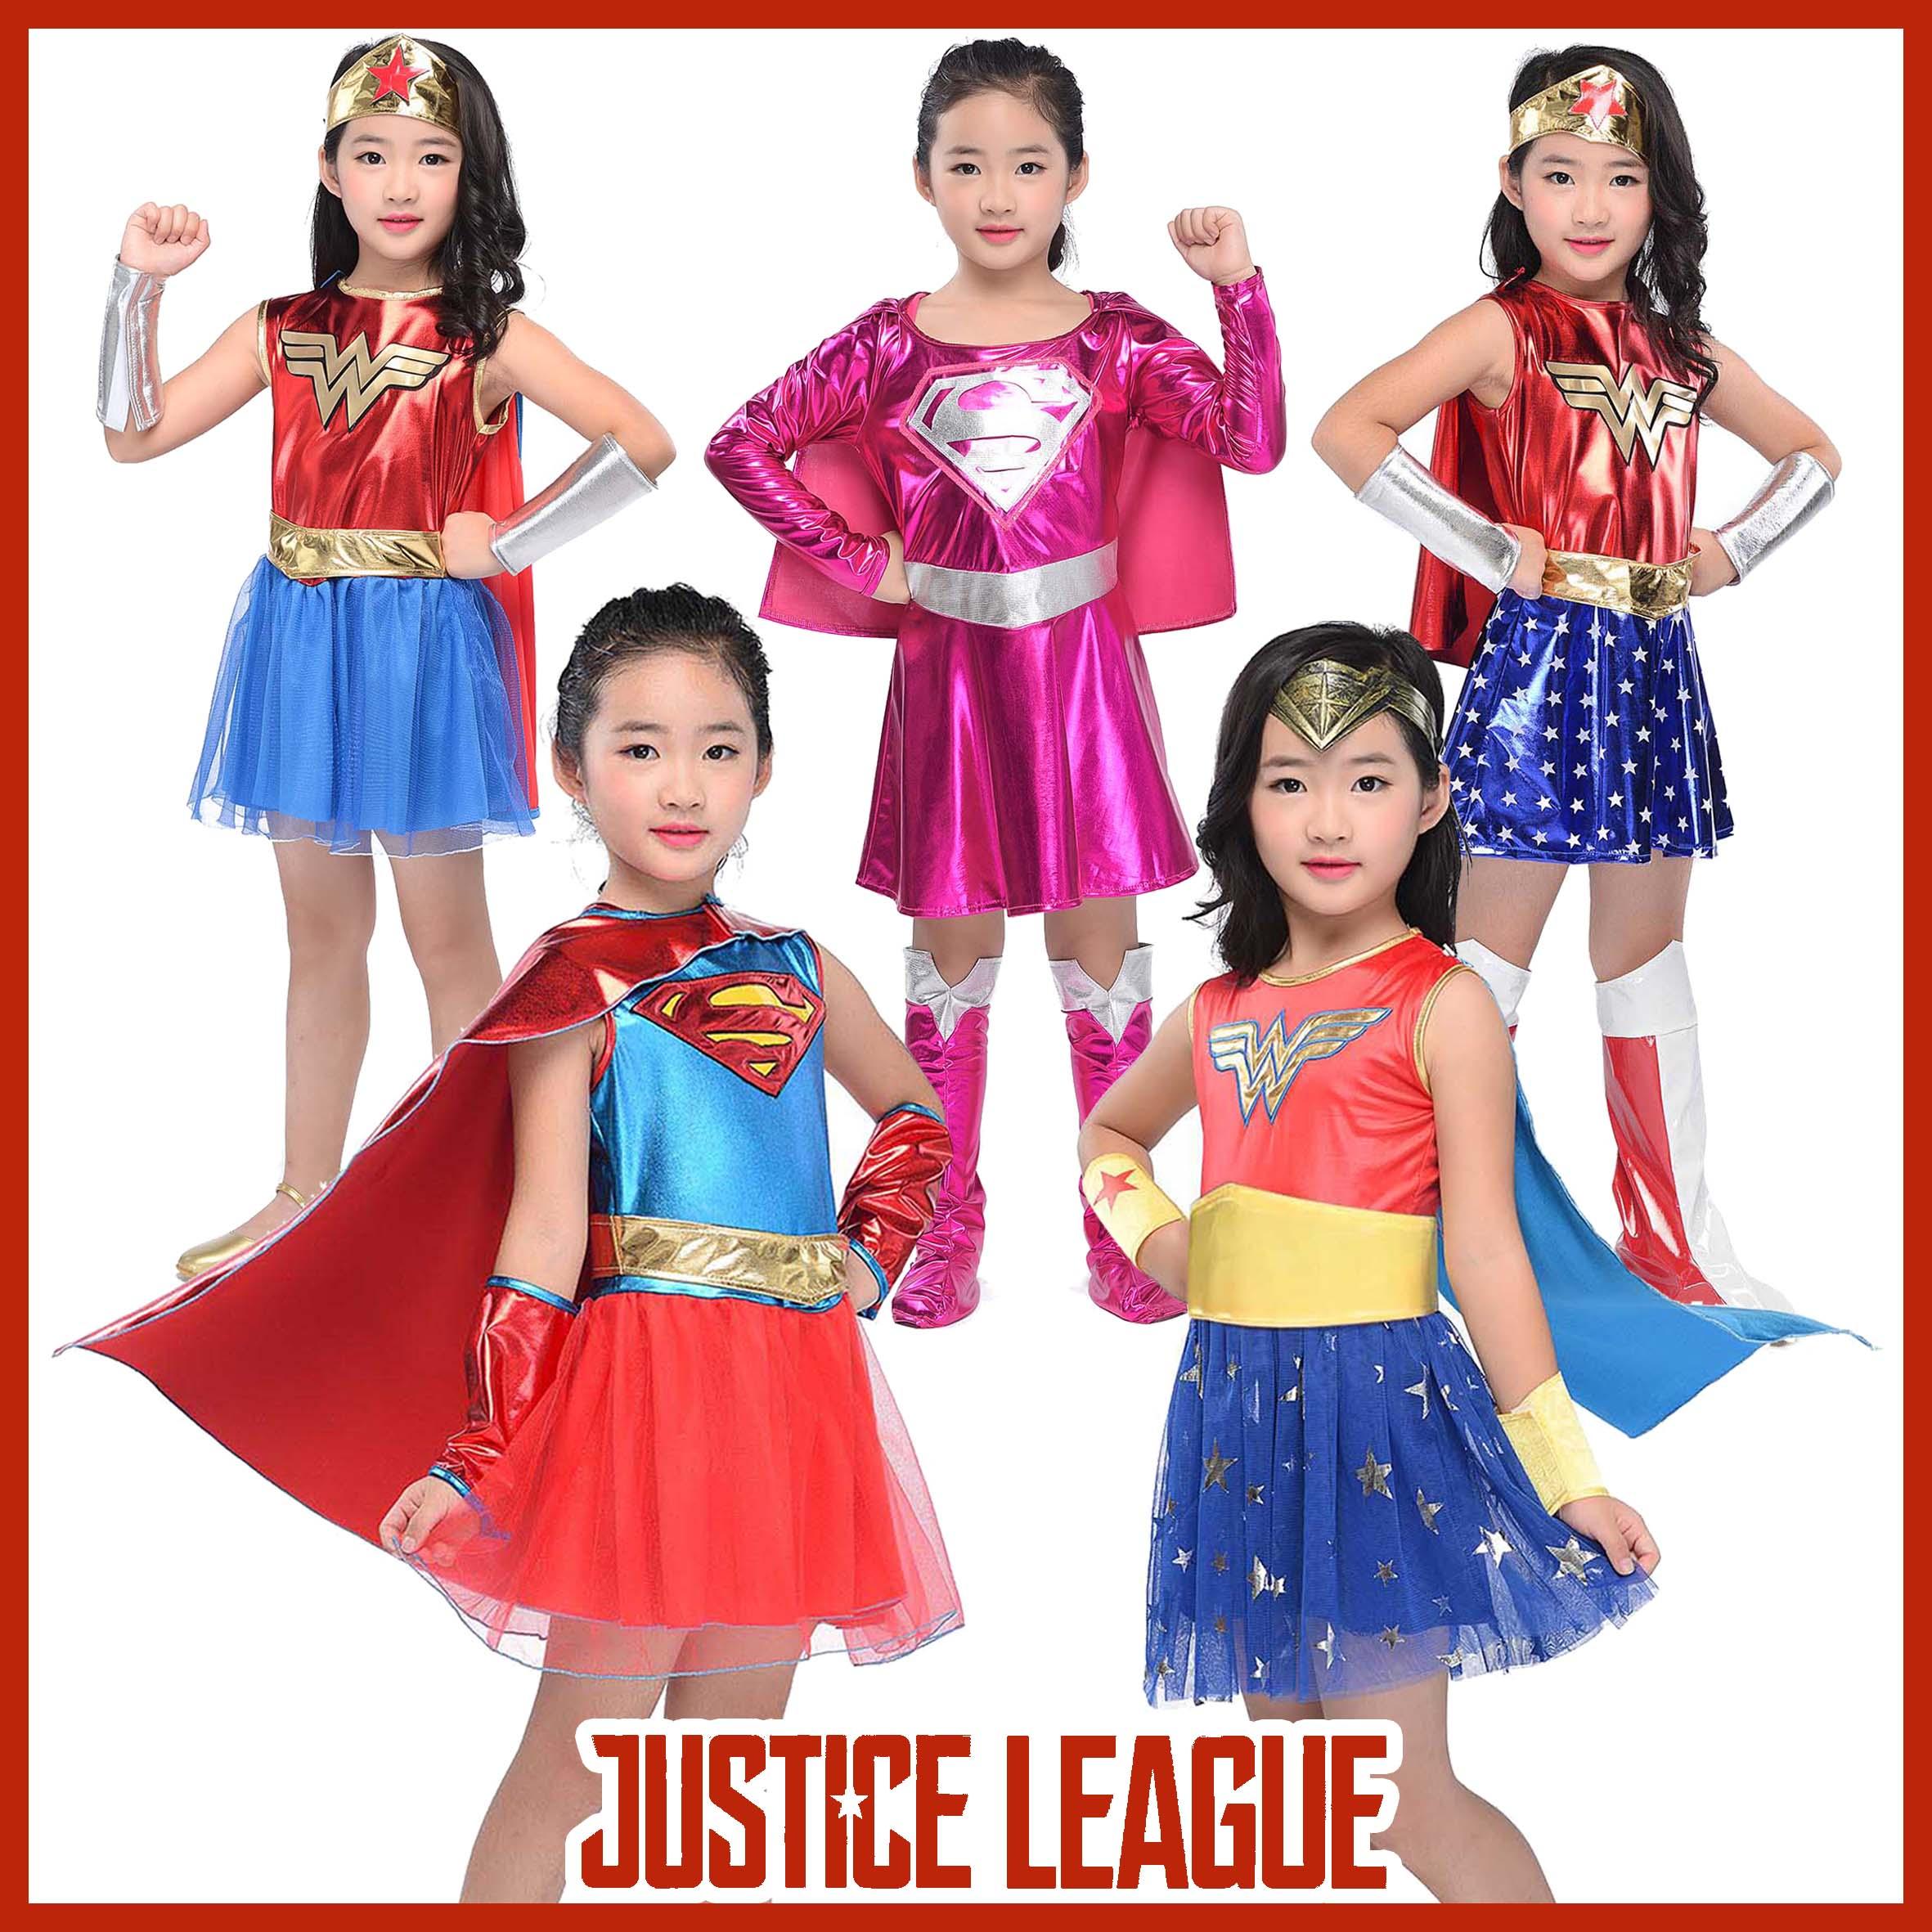 Boys Girls Justice League Superhero TV DC Comic Film Fancy Dress Costume Outfits